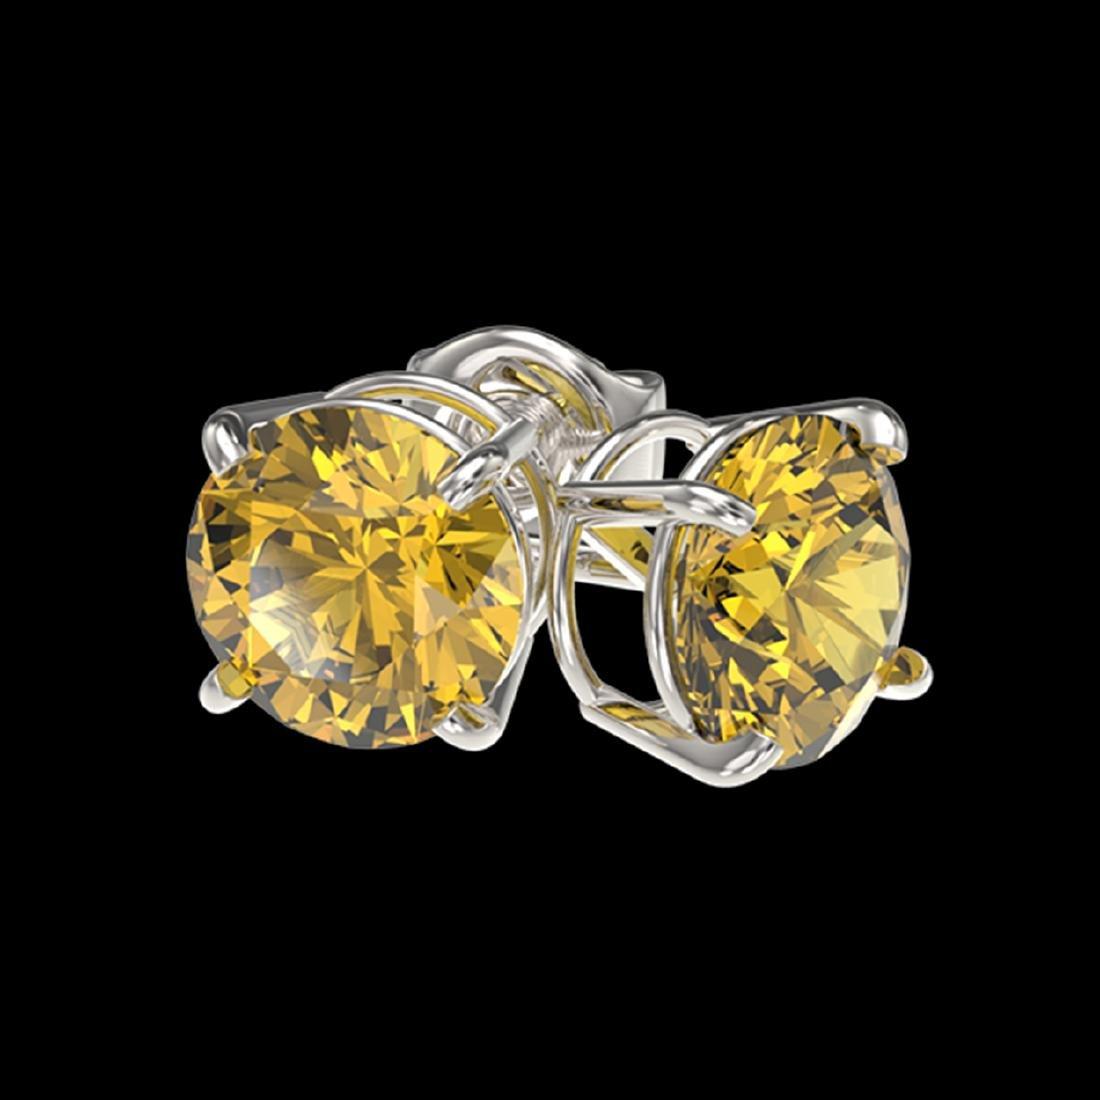 1.54 ctw Intense Yellow Diamond Stud Earrings 10K White - 3